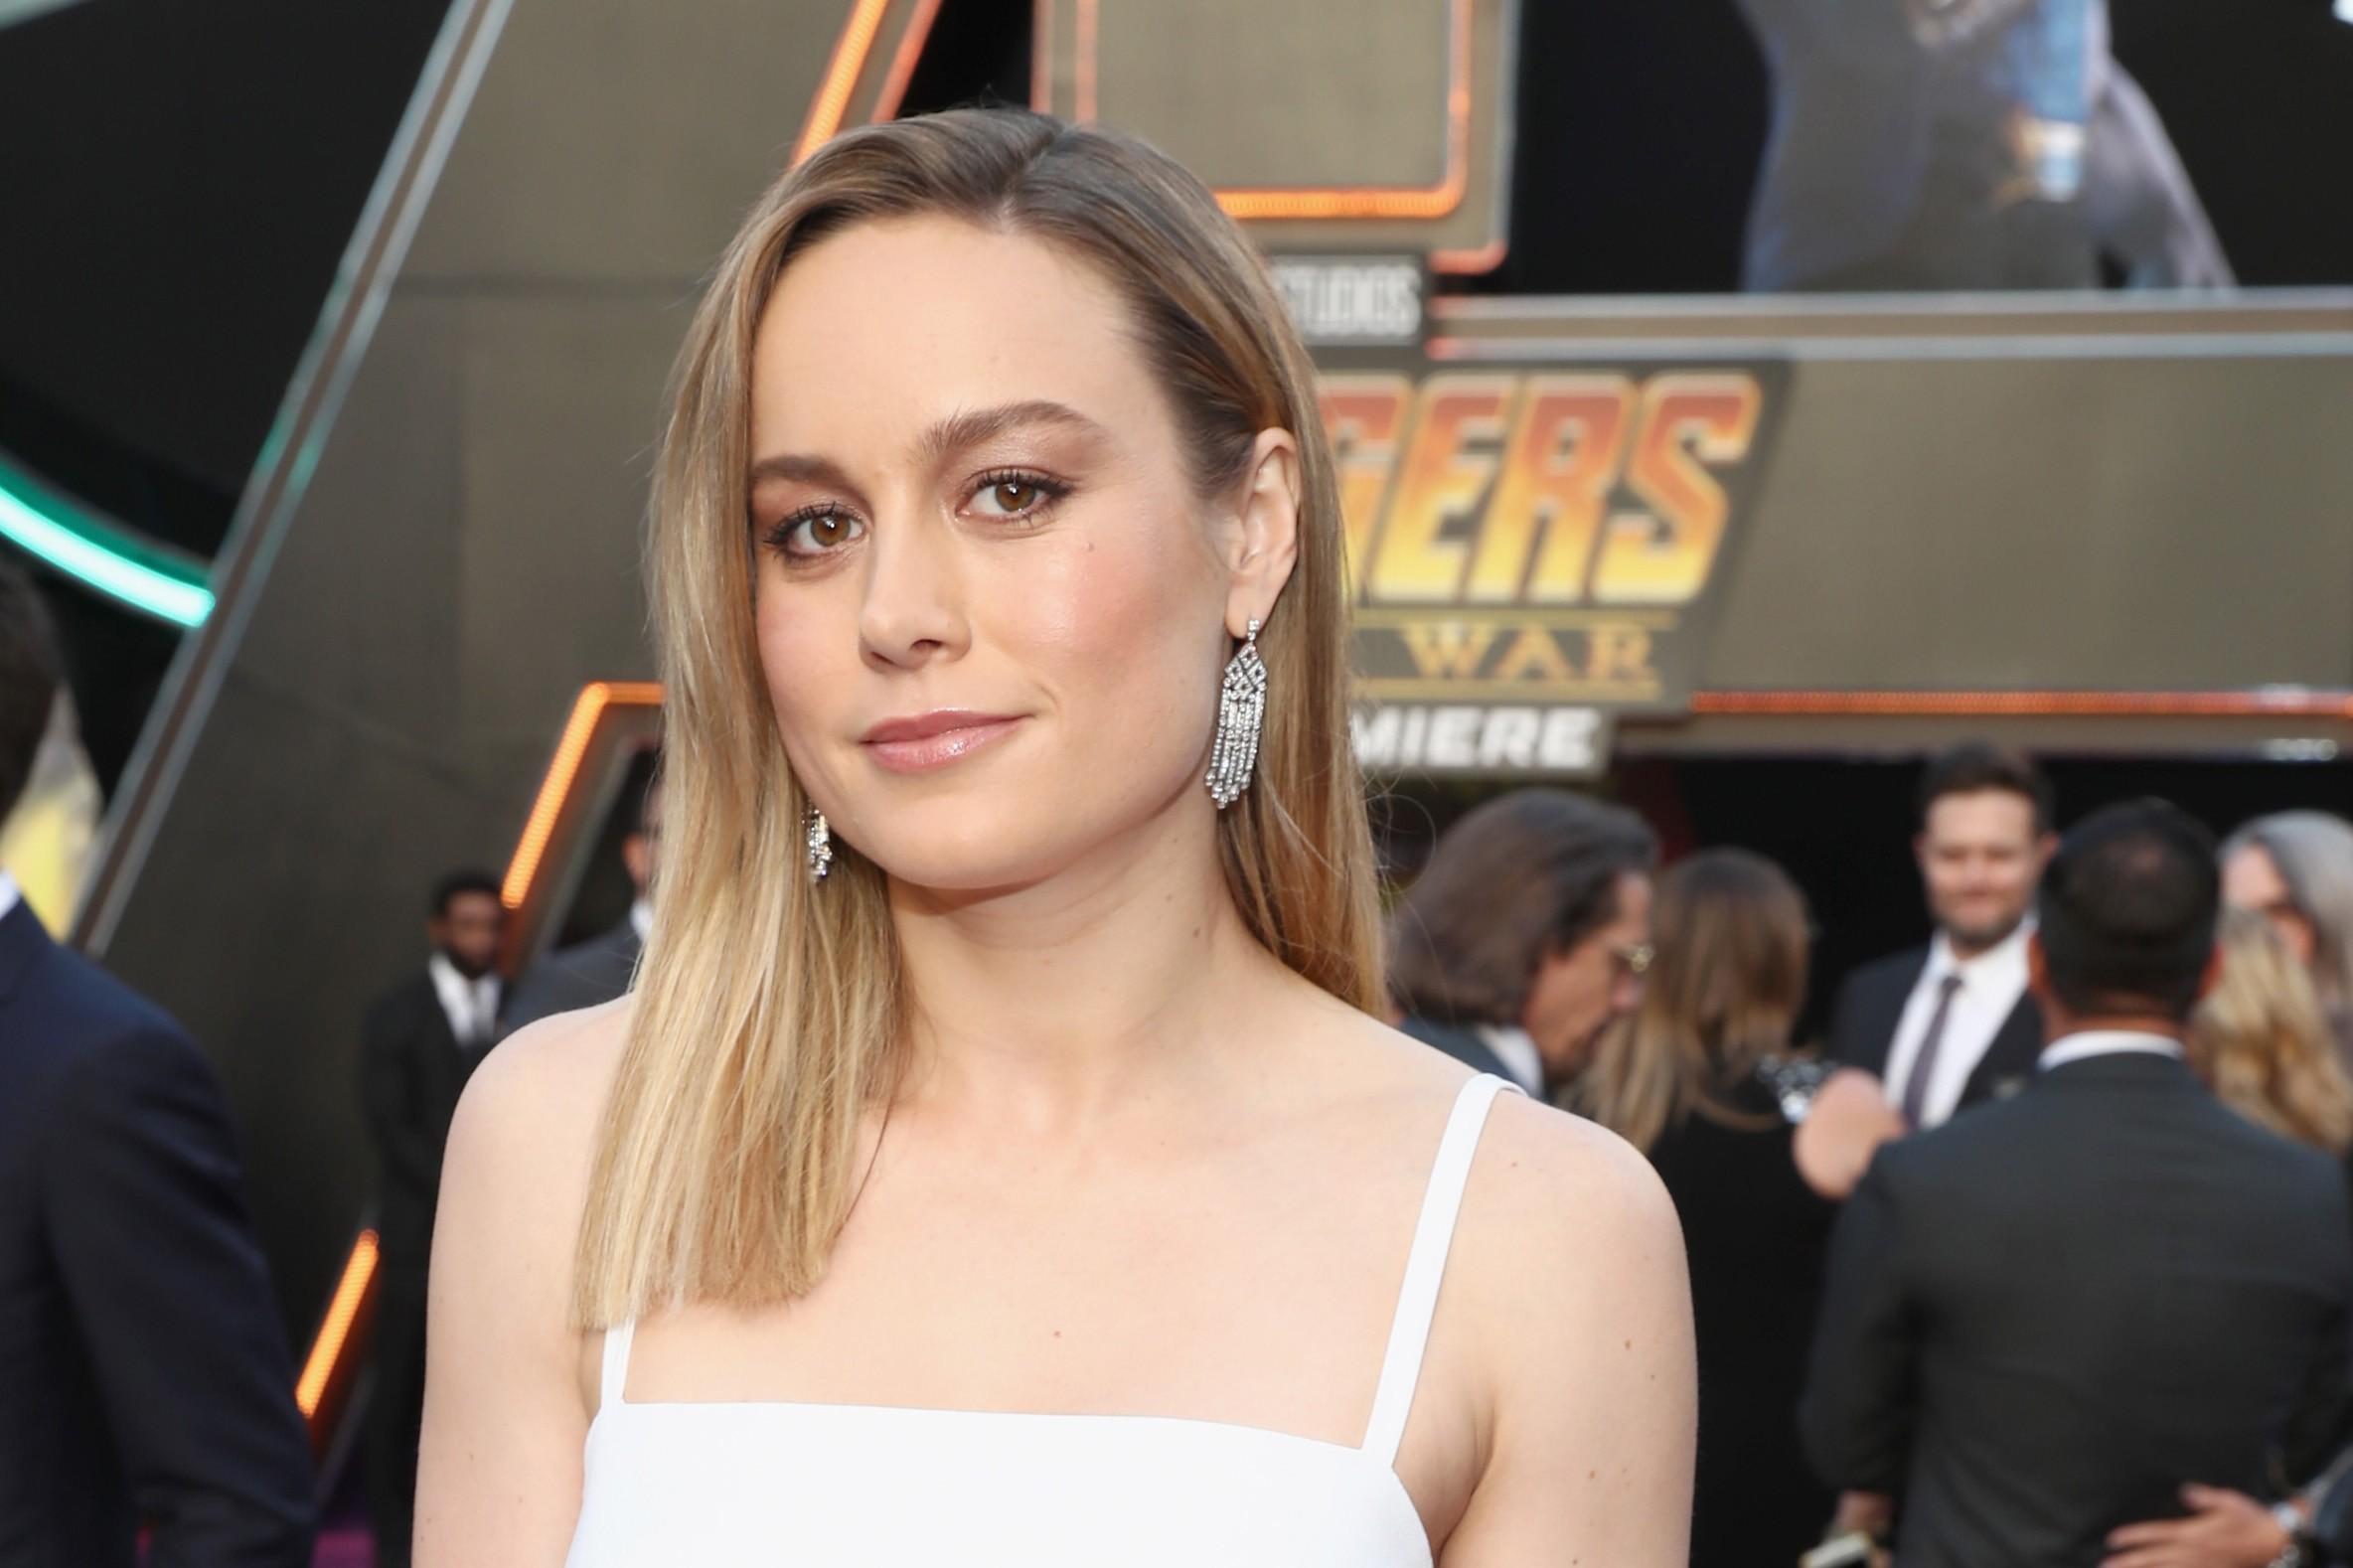 Captain Marvel star Brie Larson attends Avengers: Infinity War premiere (Getty)